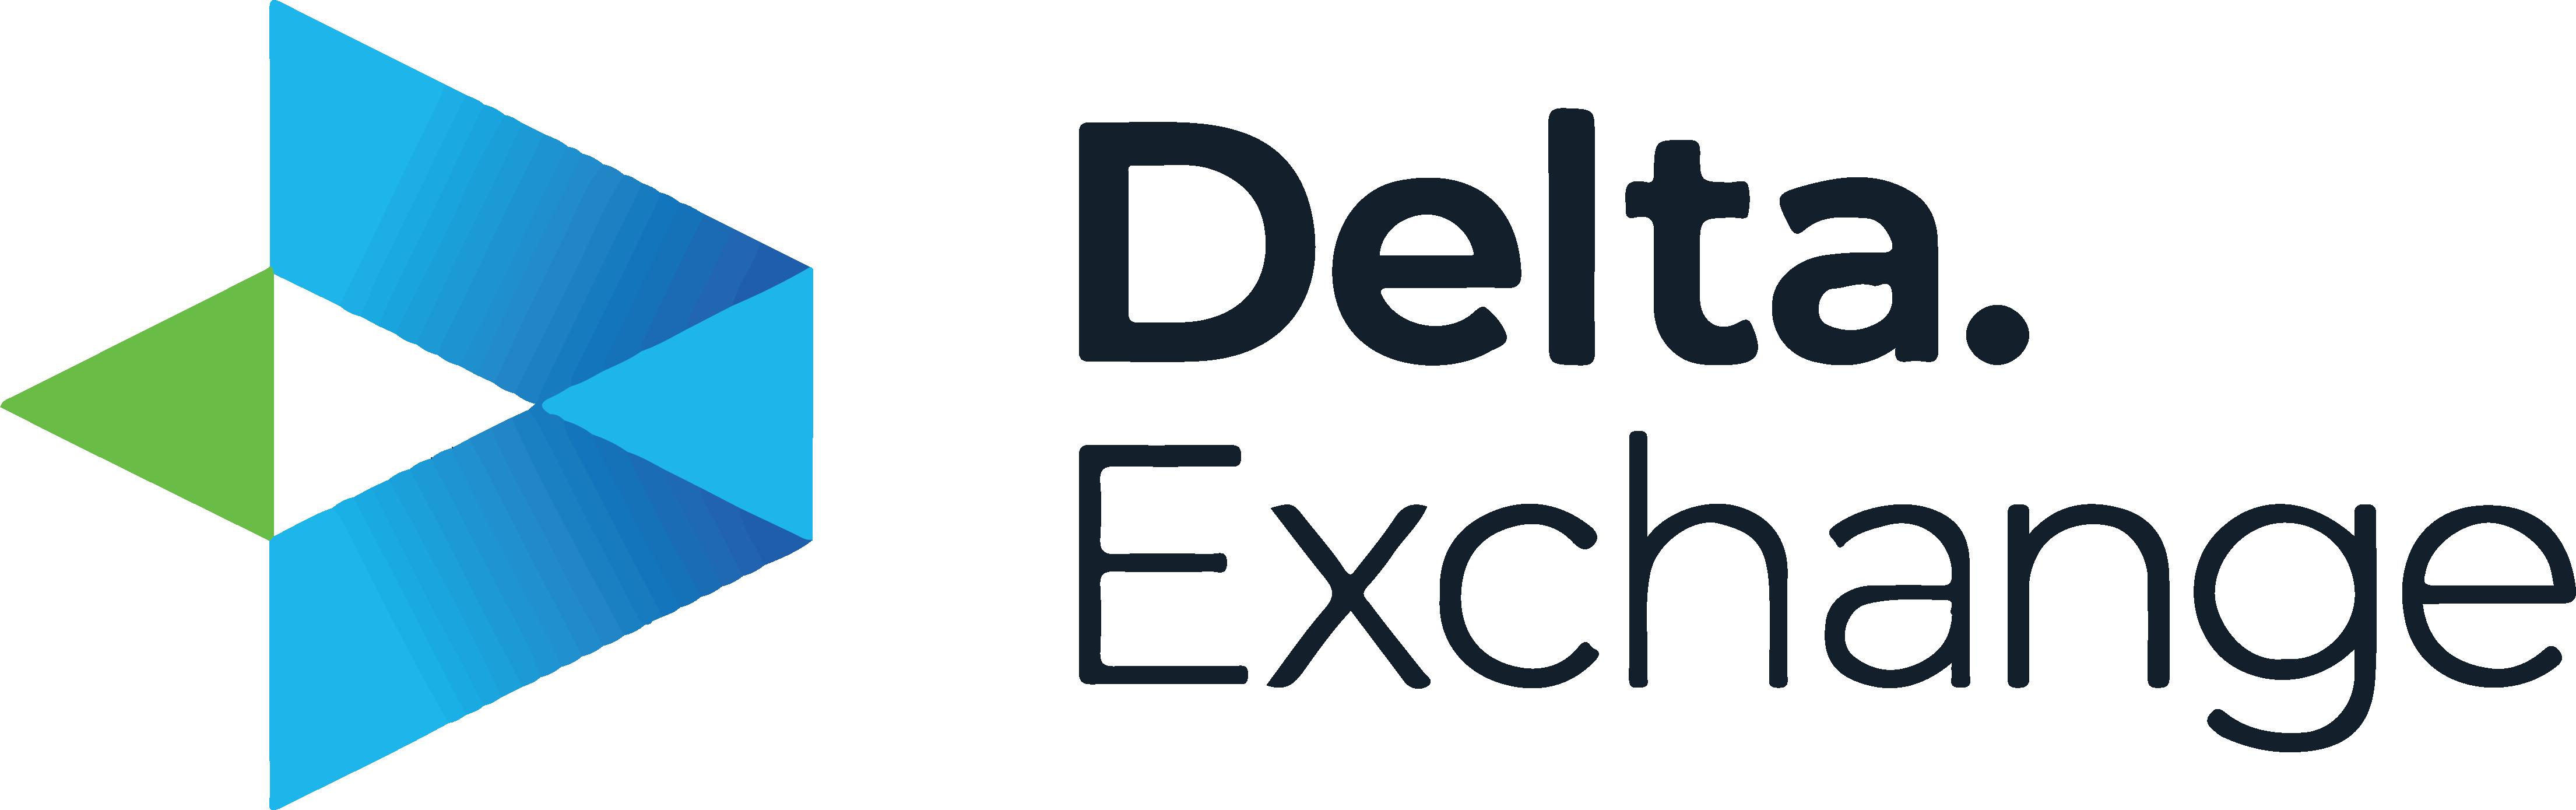 Delta.exchange logo